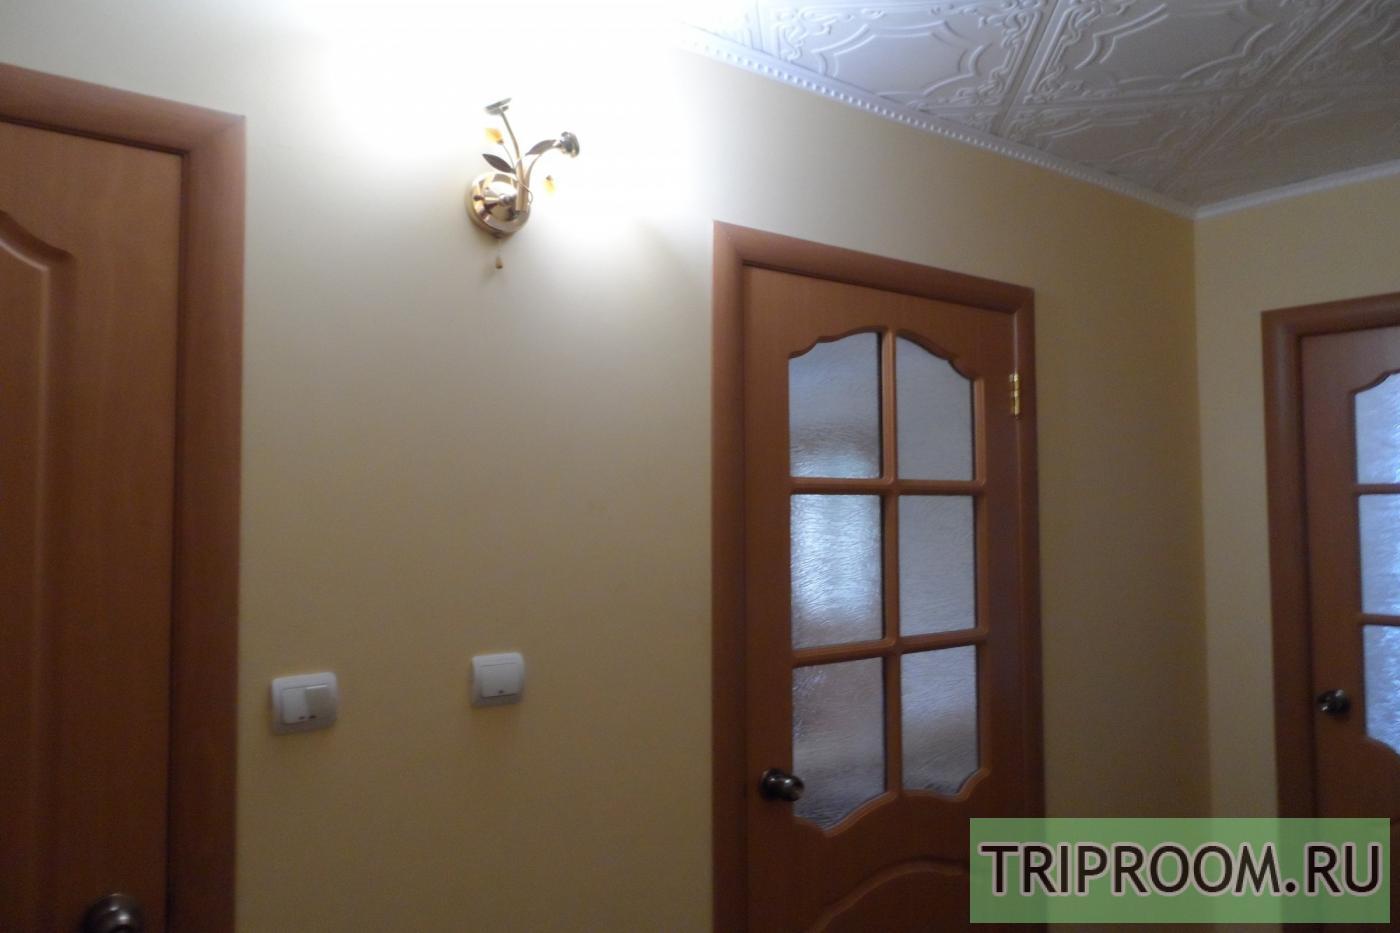 2-комнатная квартира посуточно (вариант № 31690), ул. квартал Б, фото № 10